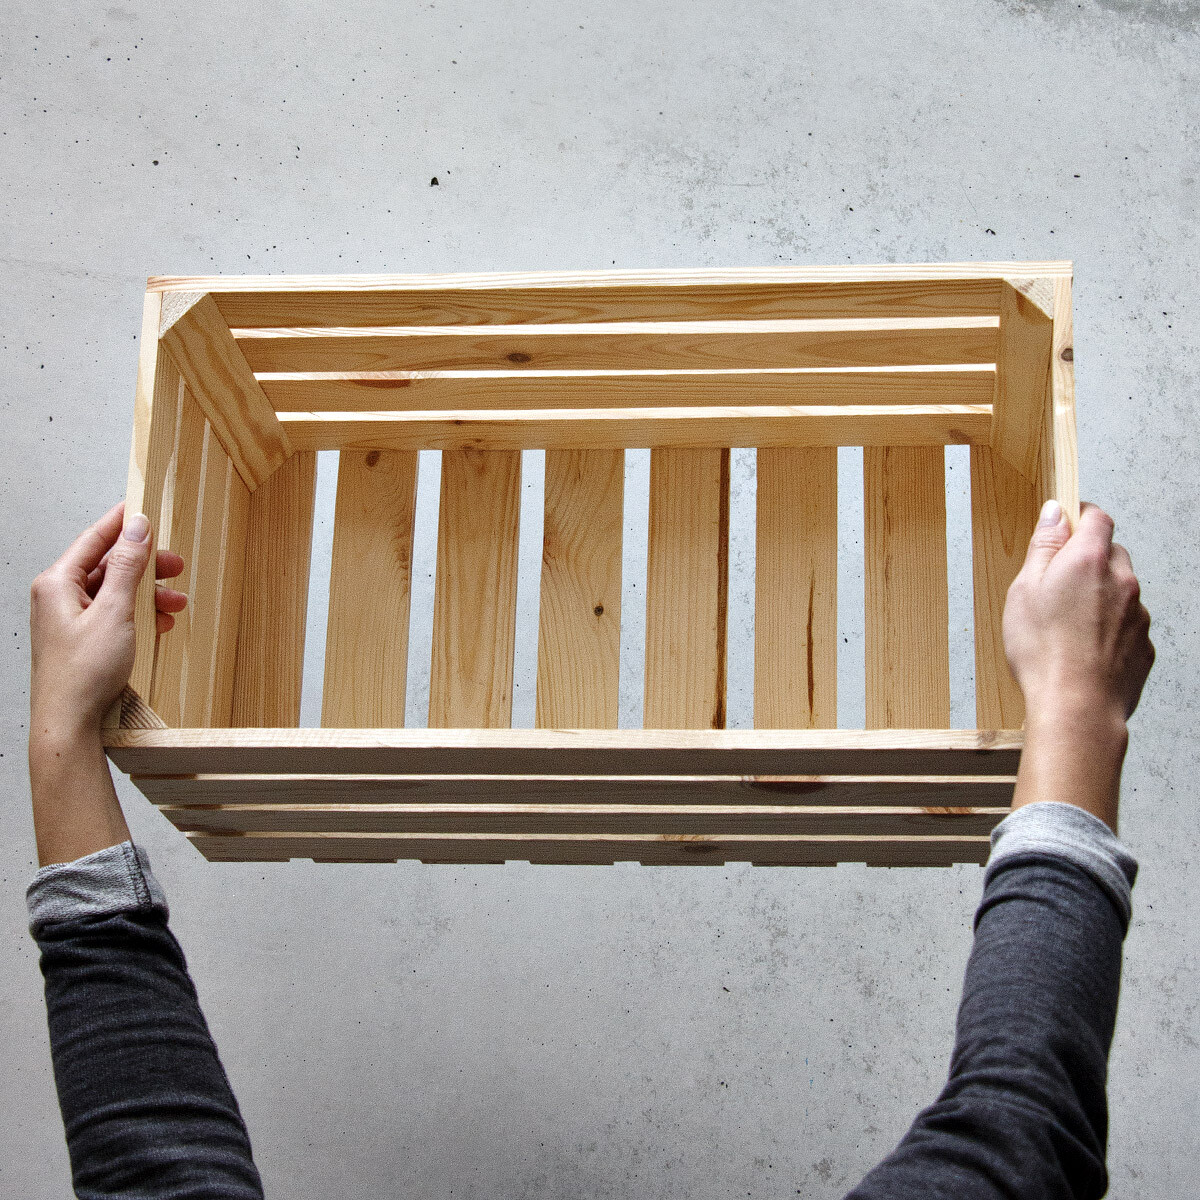 35 liter holzkiste stiege holz 50 x 27 cm material 1 cm weinkiste. Black Bedroom Furniture Sets. Home Design Ideas